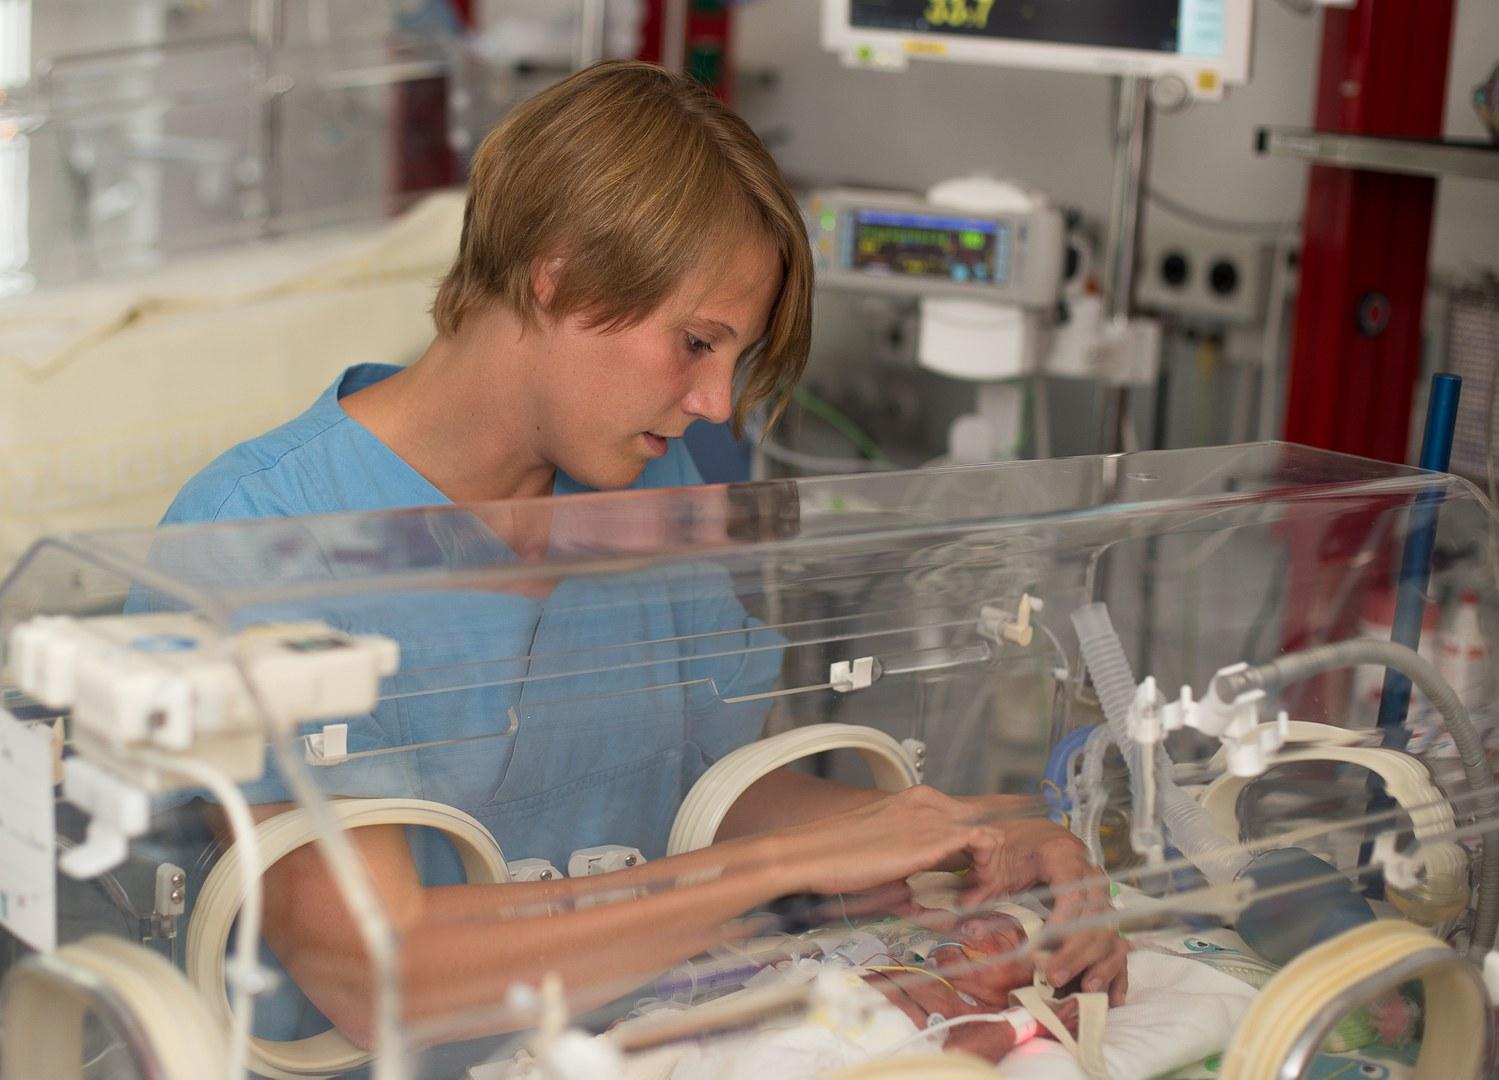 Neugeborenen-Intensivstation am Uni-Klinikum Bonn: